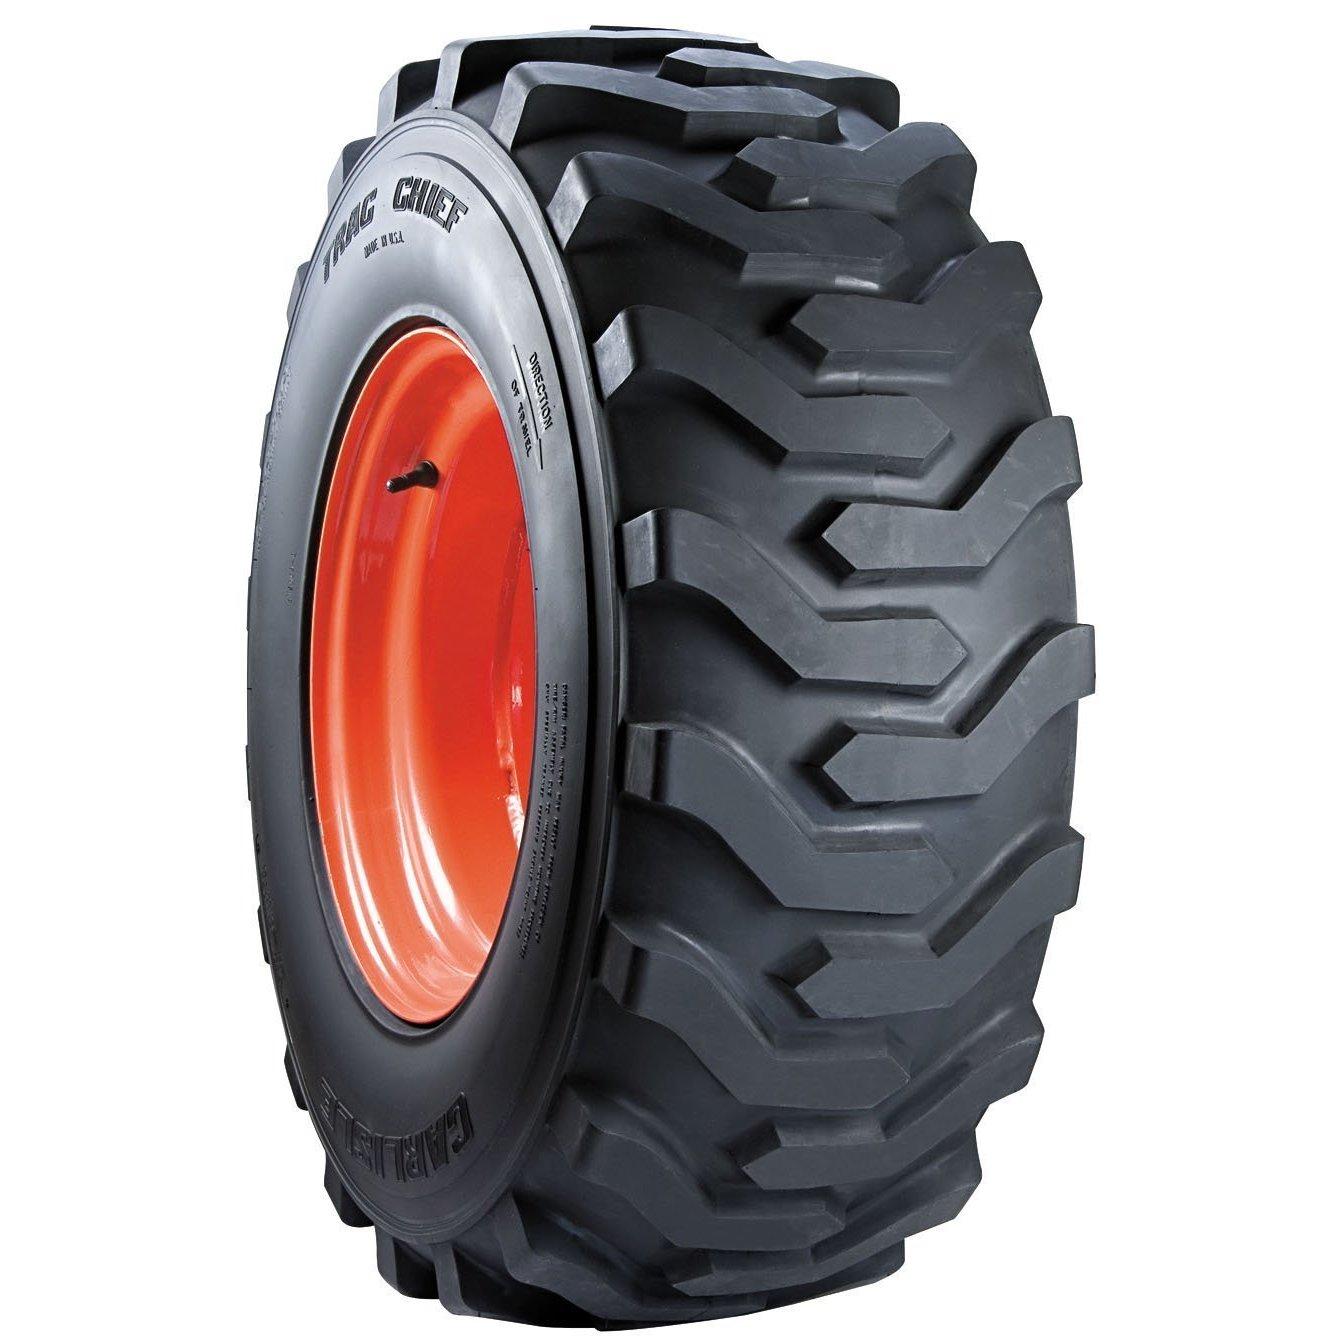 Carlisle Trac Chief R-4 Industrial Tire - 5.70-12 4-Ply (...